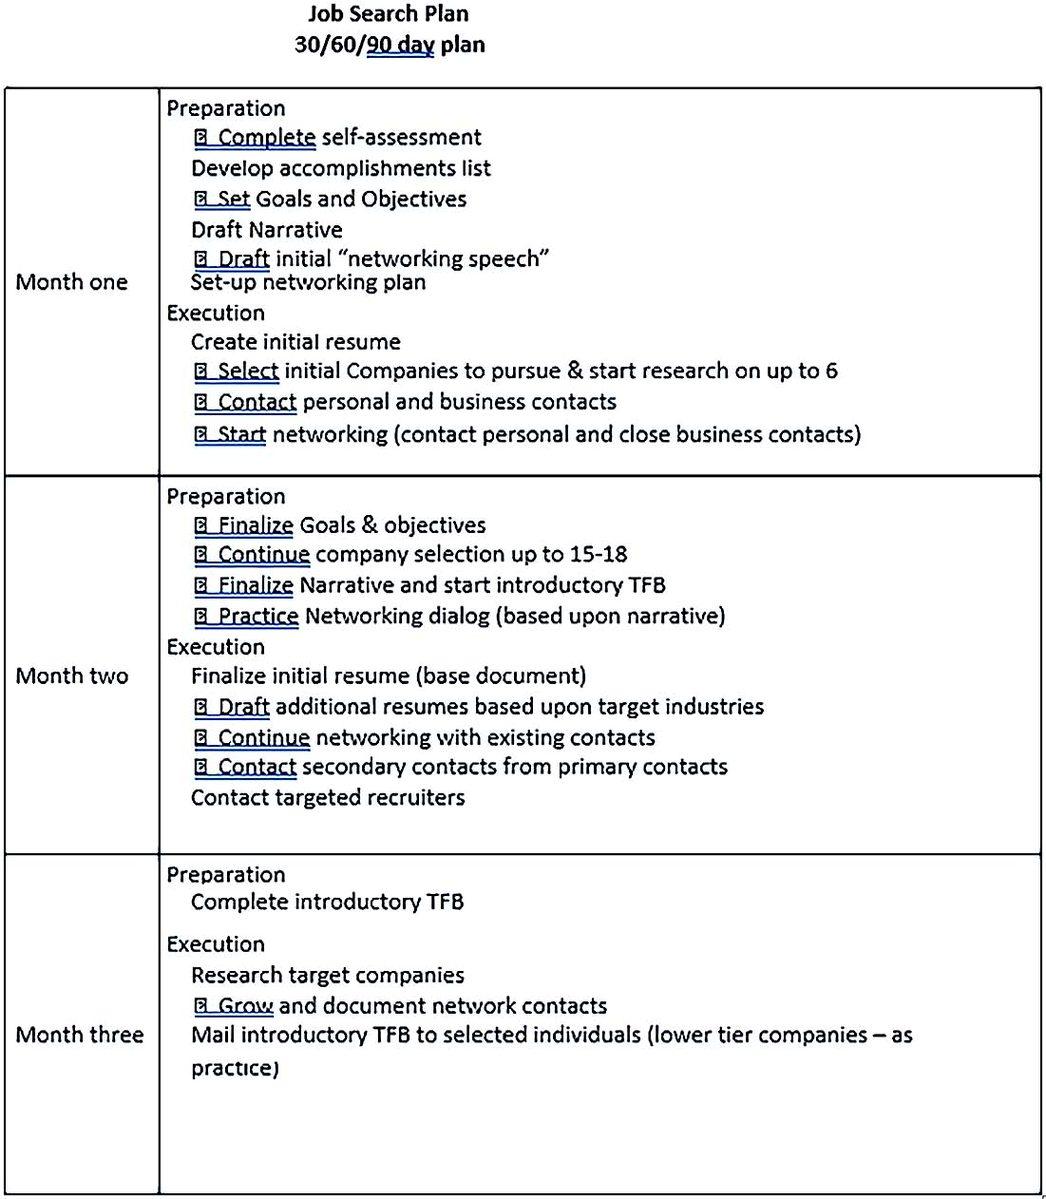 30 60 90 Day Job Search Plan Sample Template